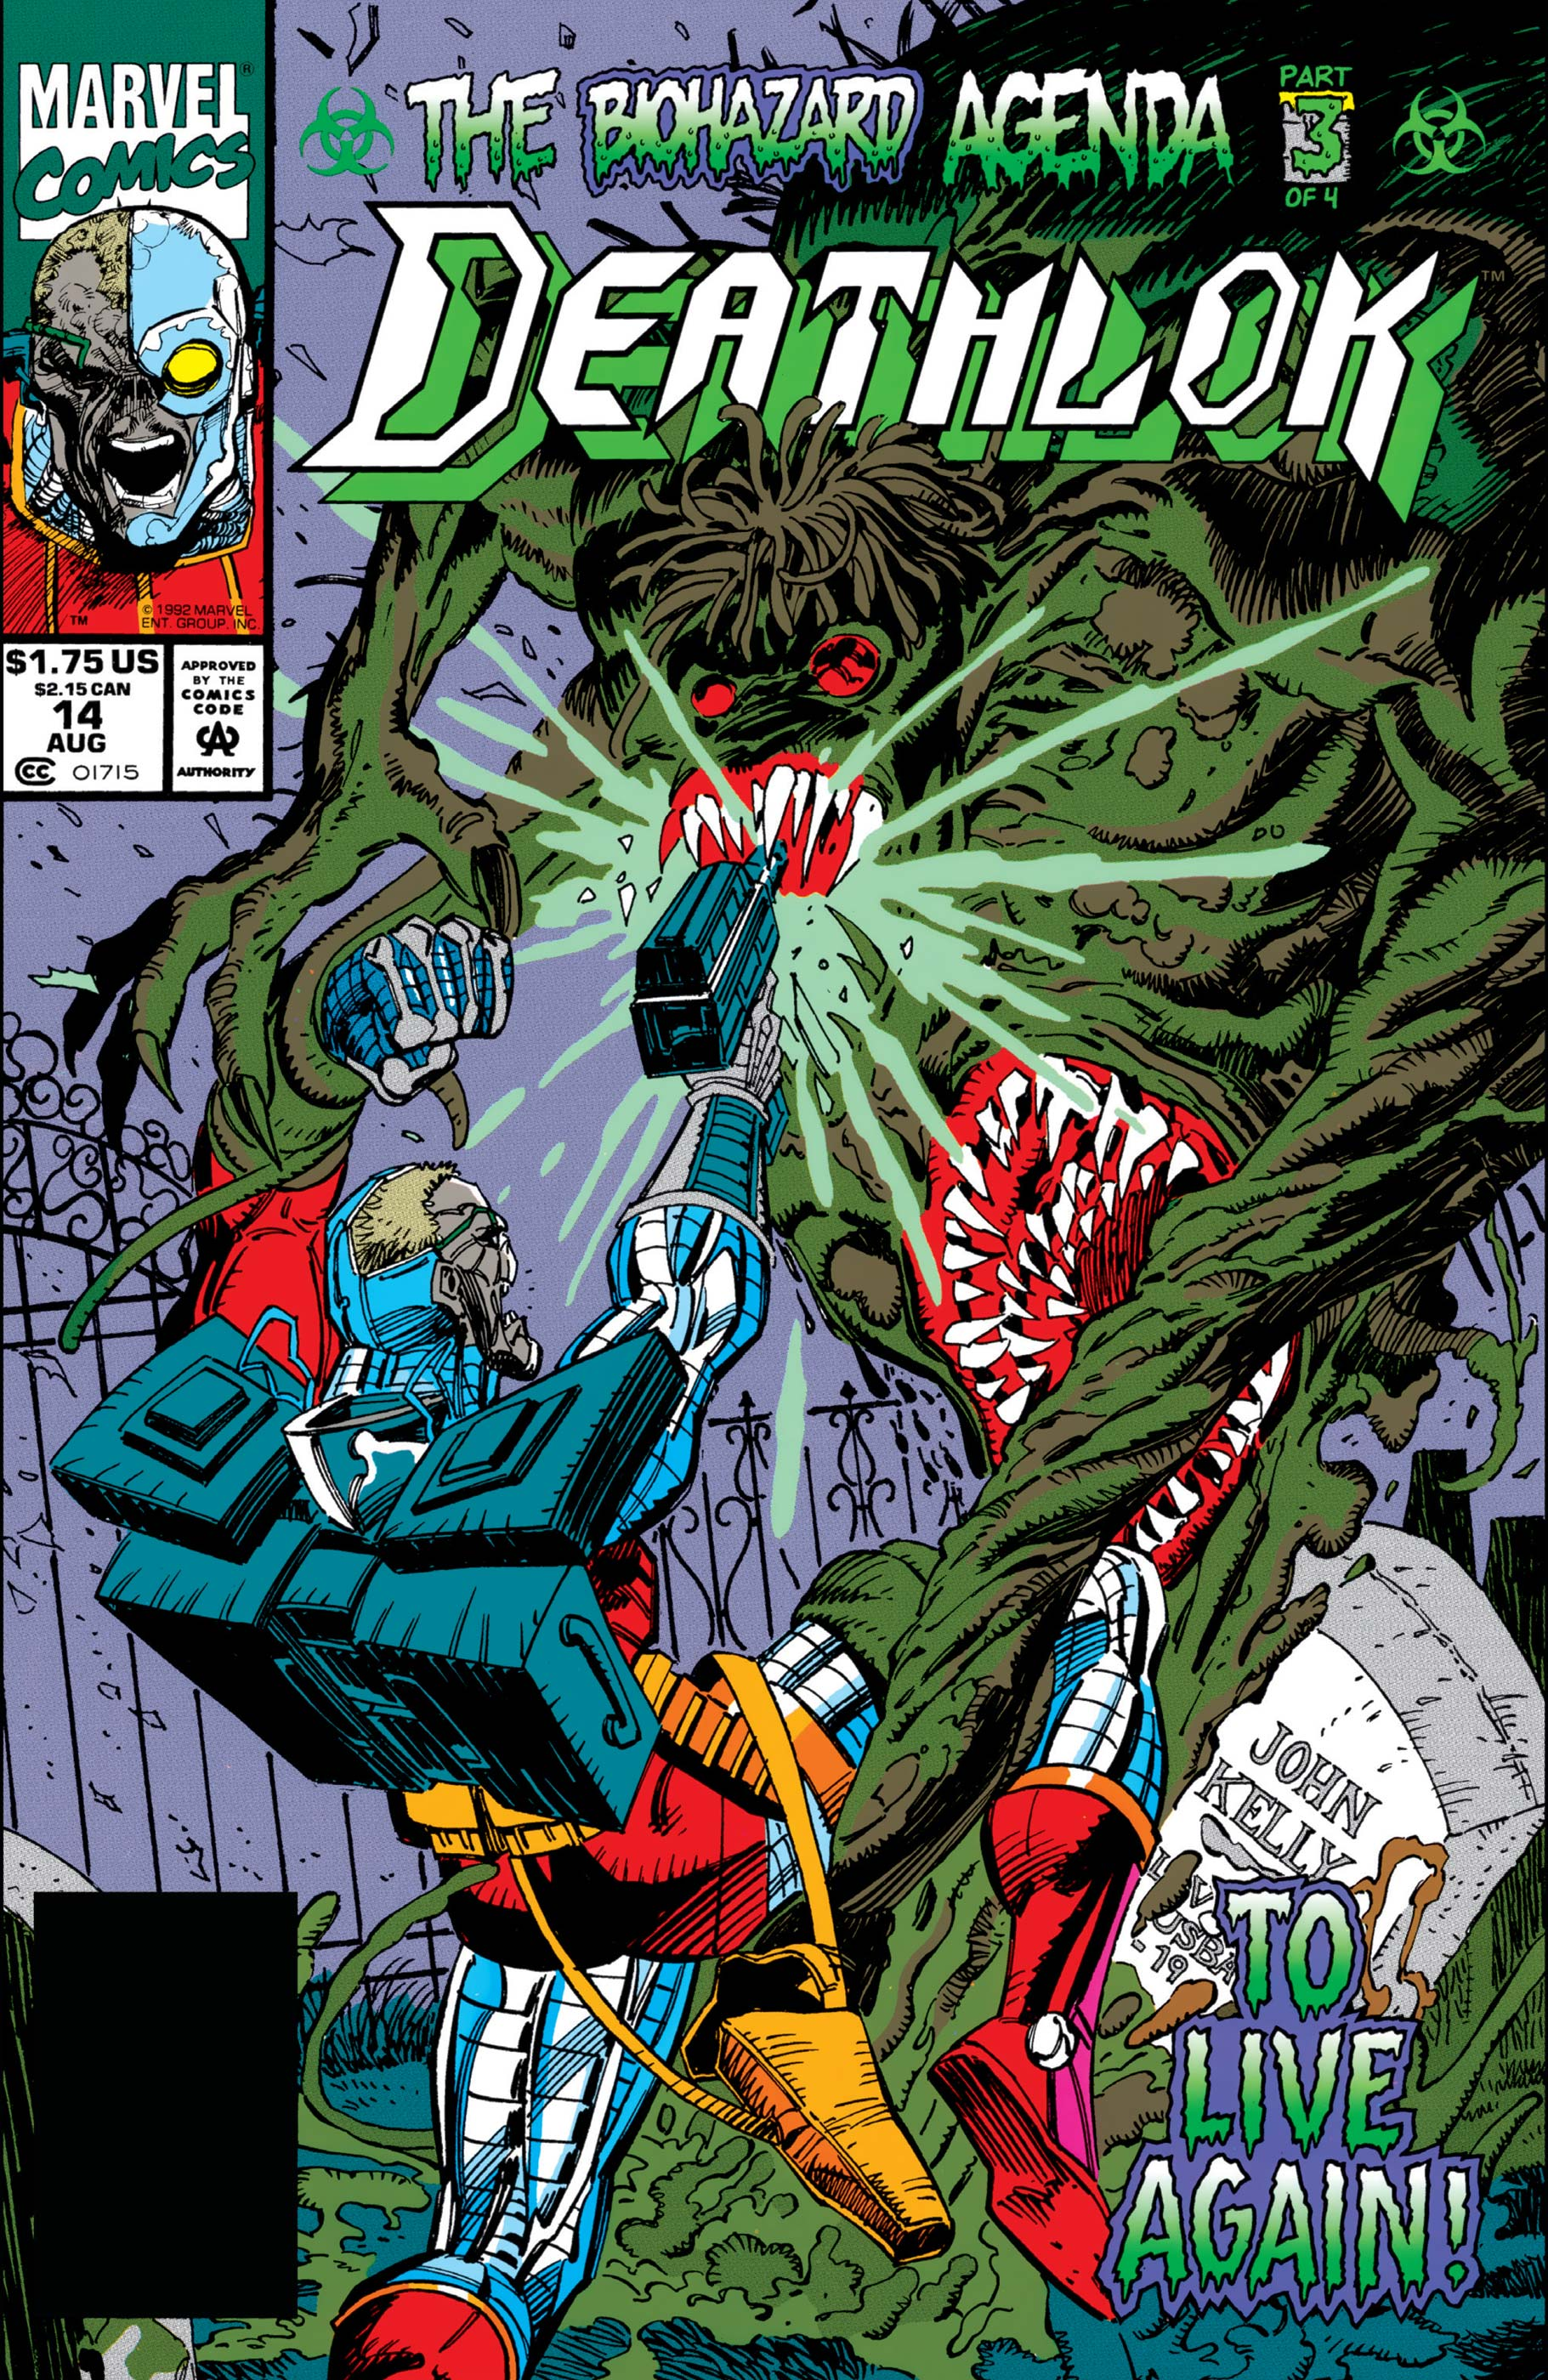 Deathlok (1991) #14